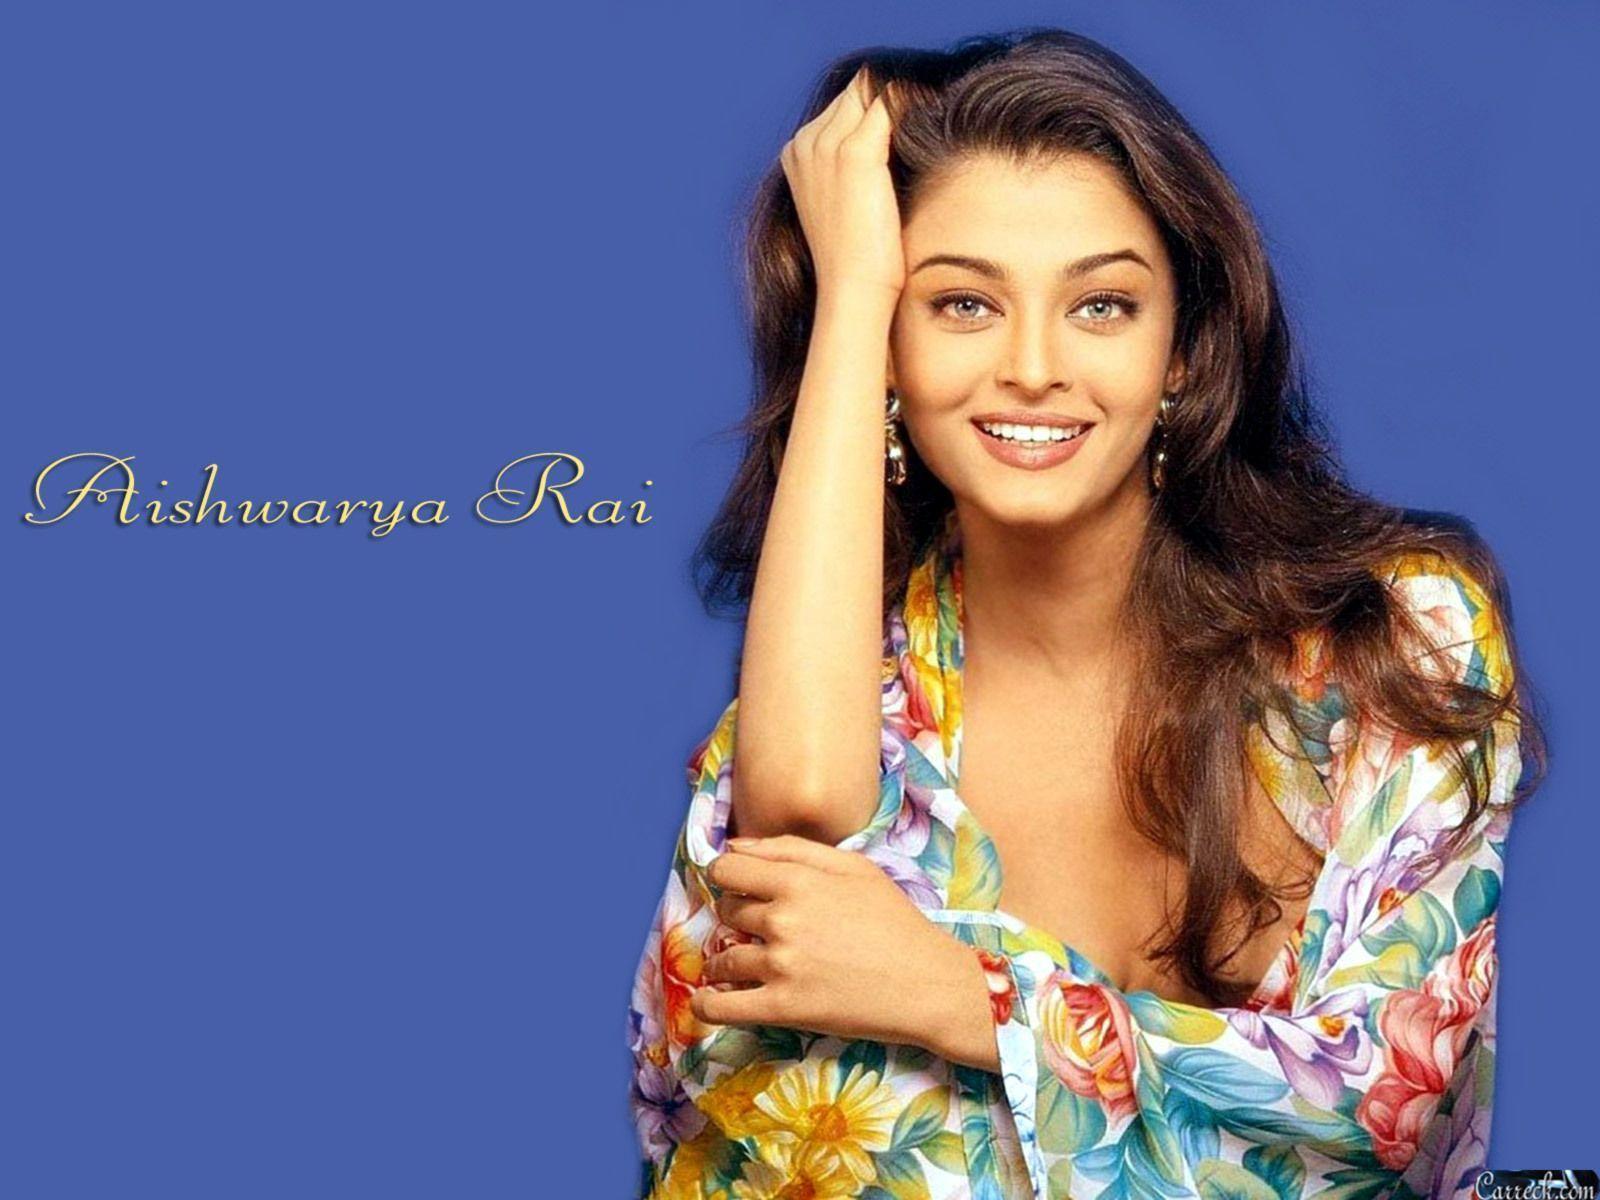 Aishwarya Rai - Aishwarya Rai Wallpaper (20683564) - Fanpop